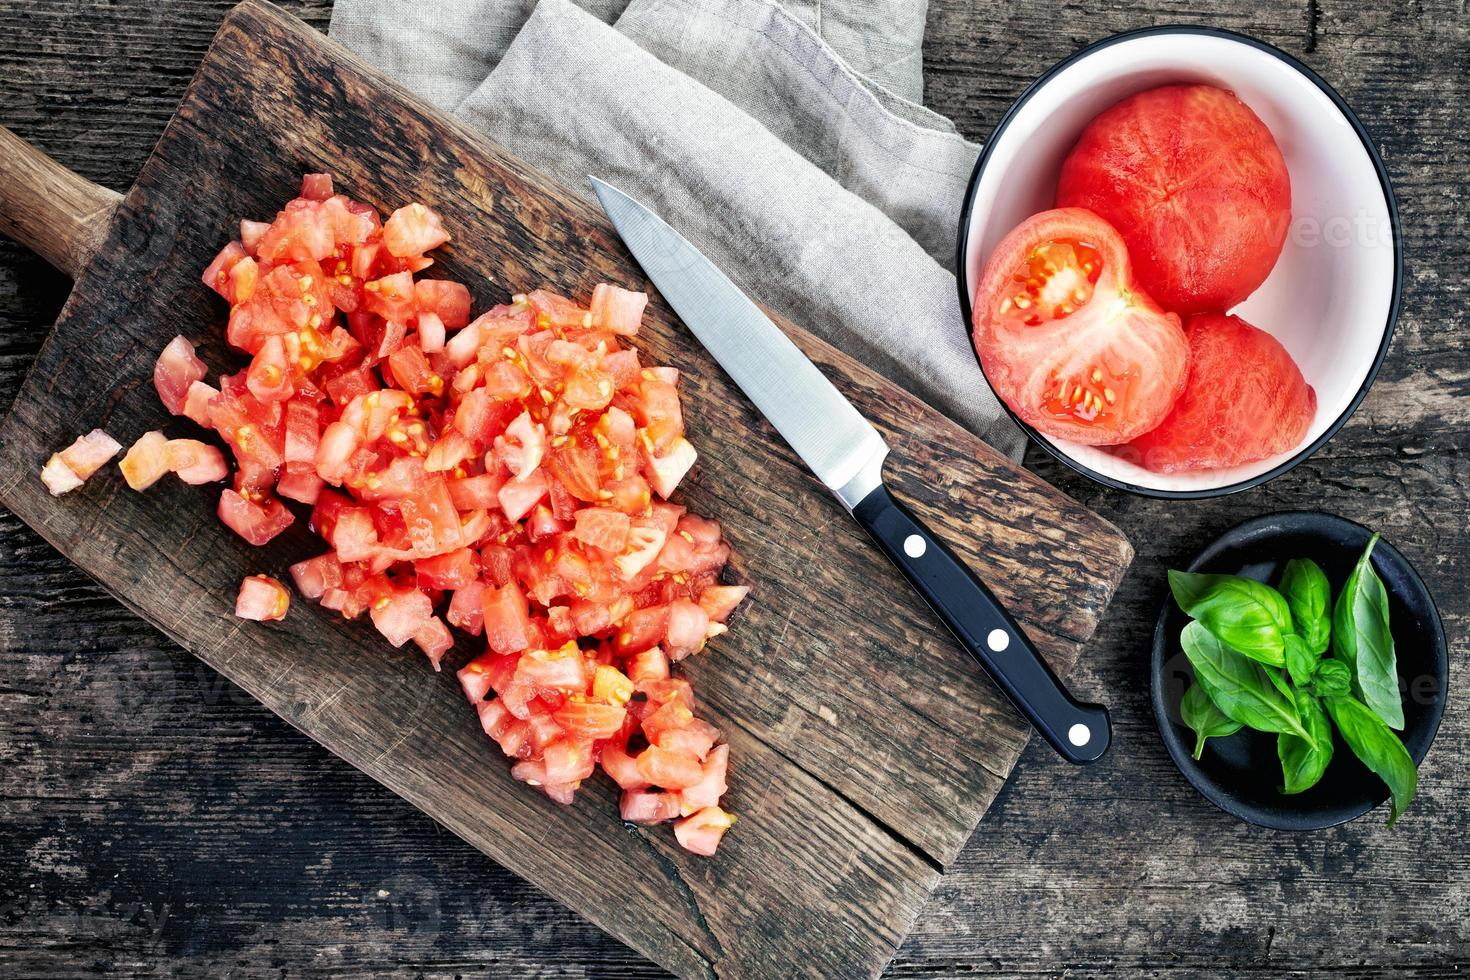 tomates picados foto